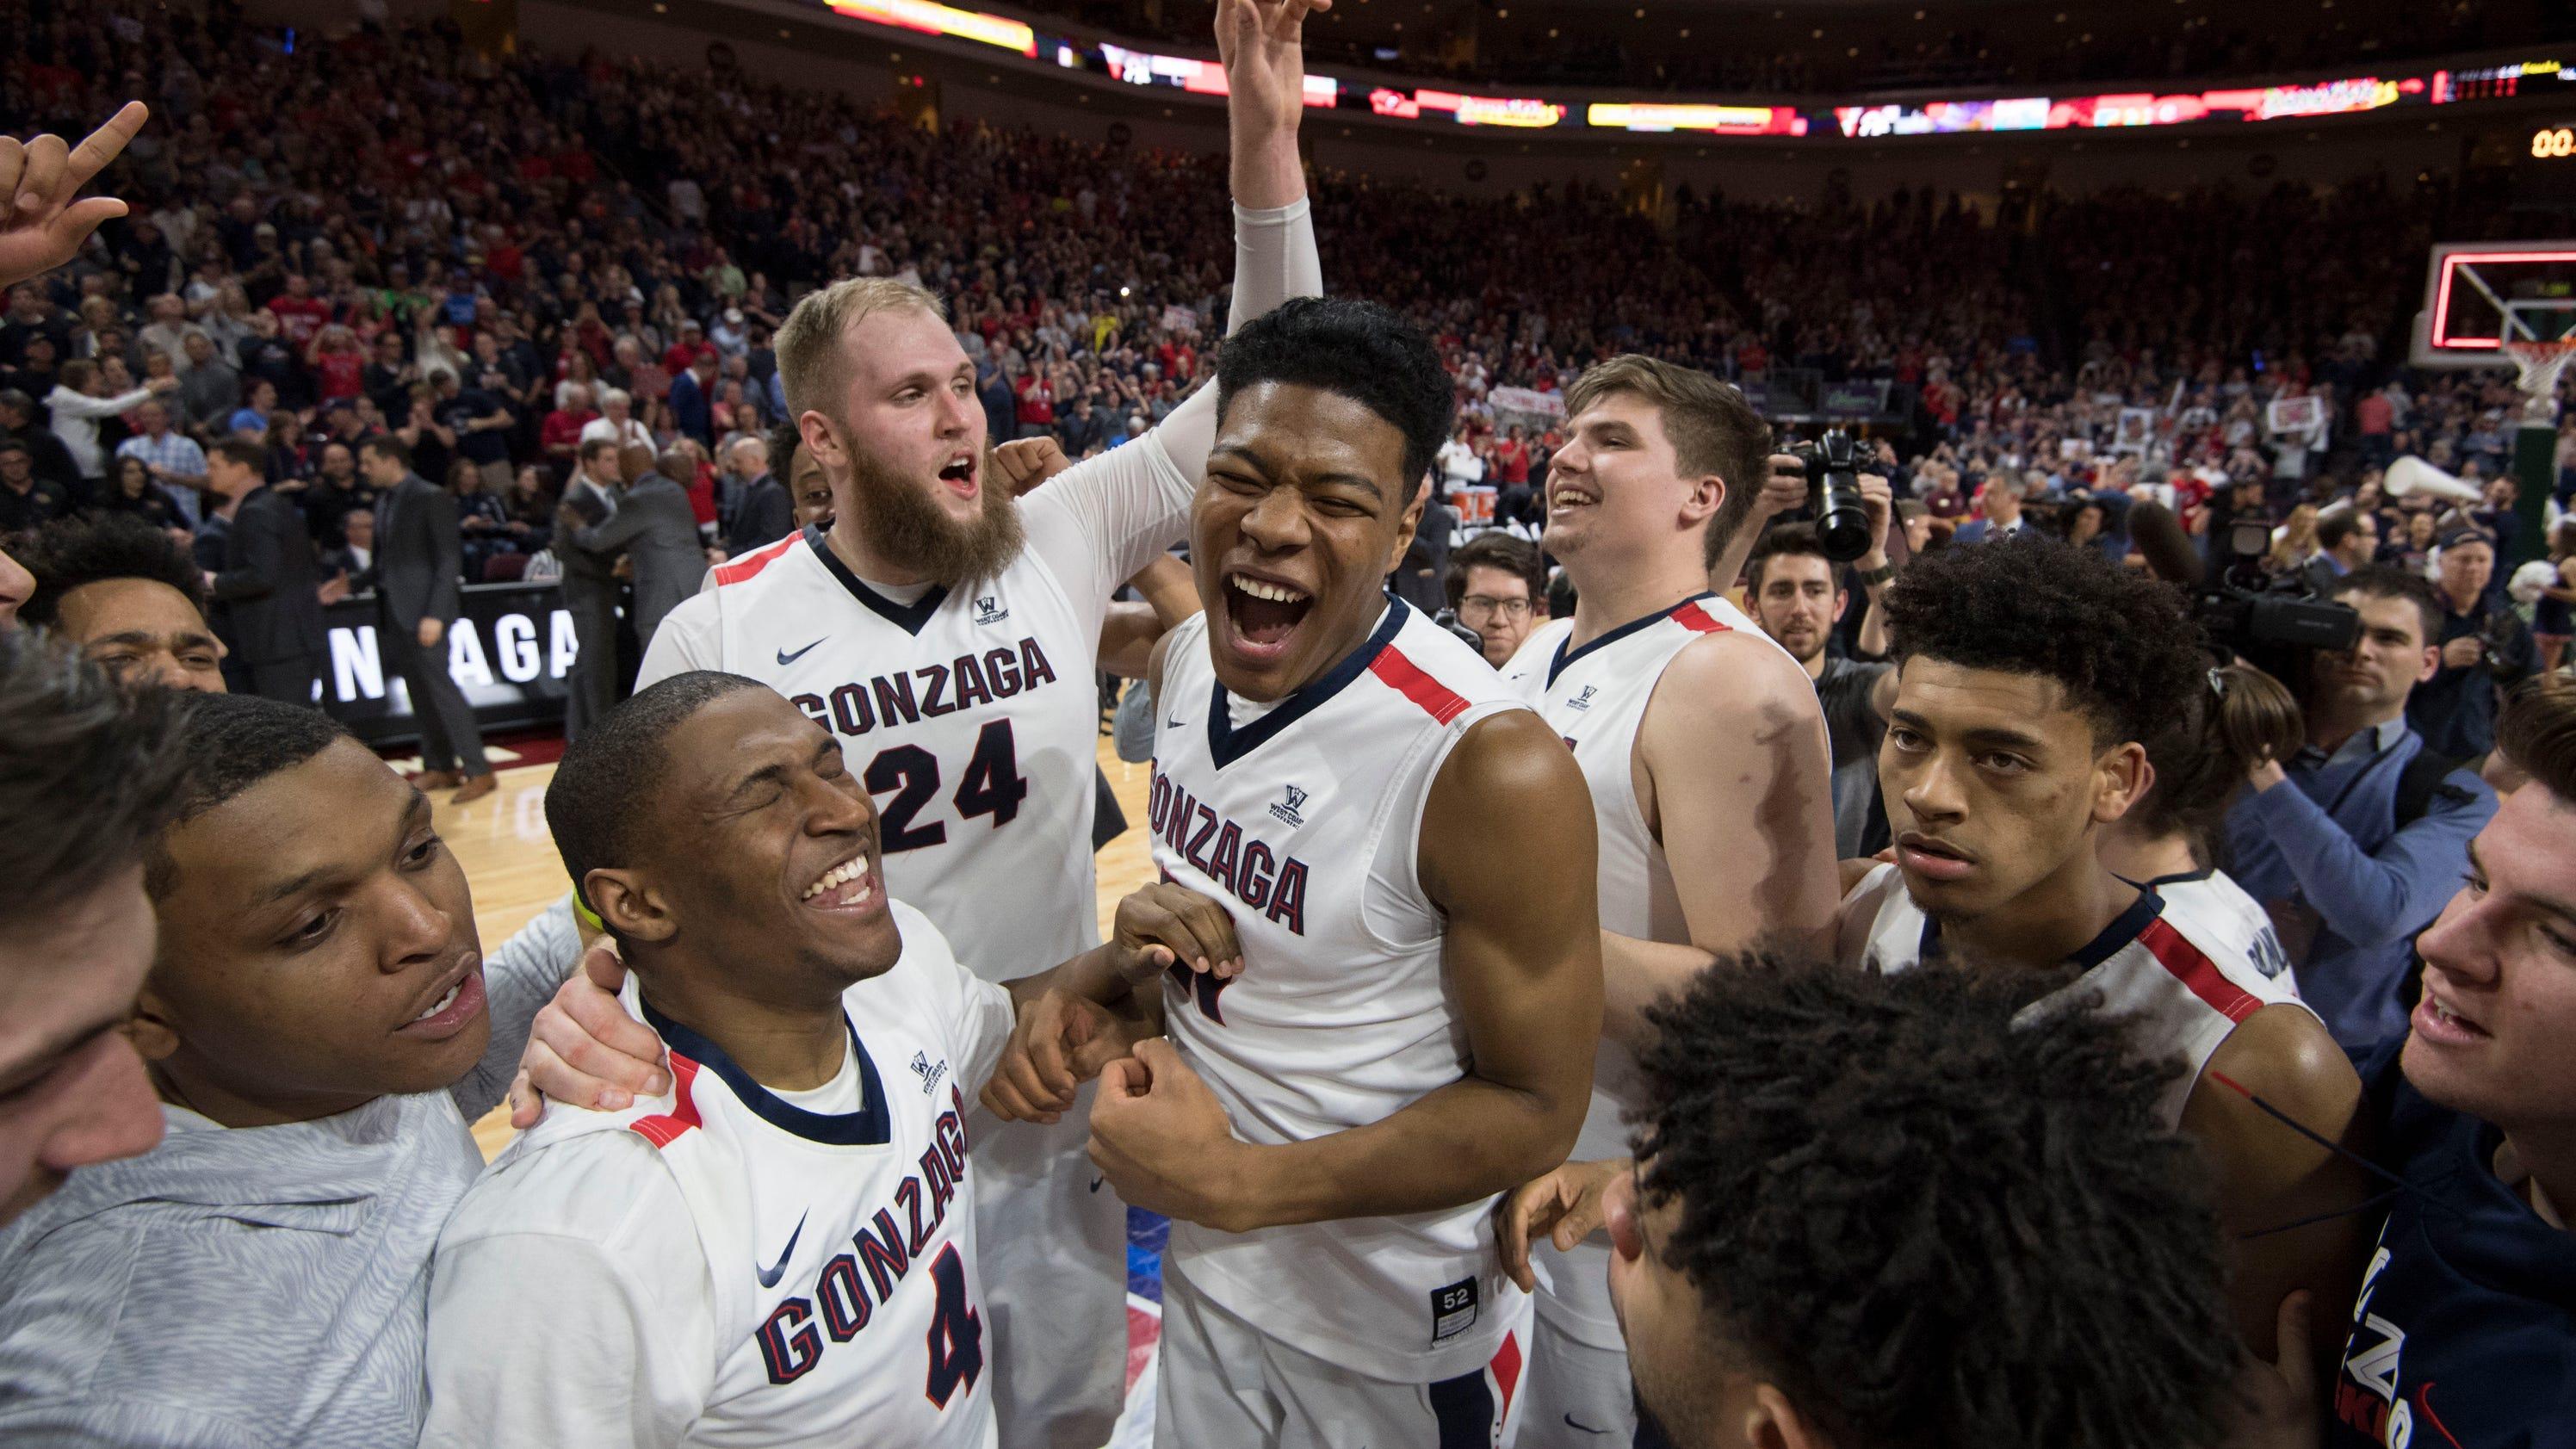 2017 NCAA Division I Men's Basketball Tournament - Wikipedia